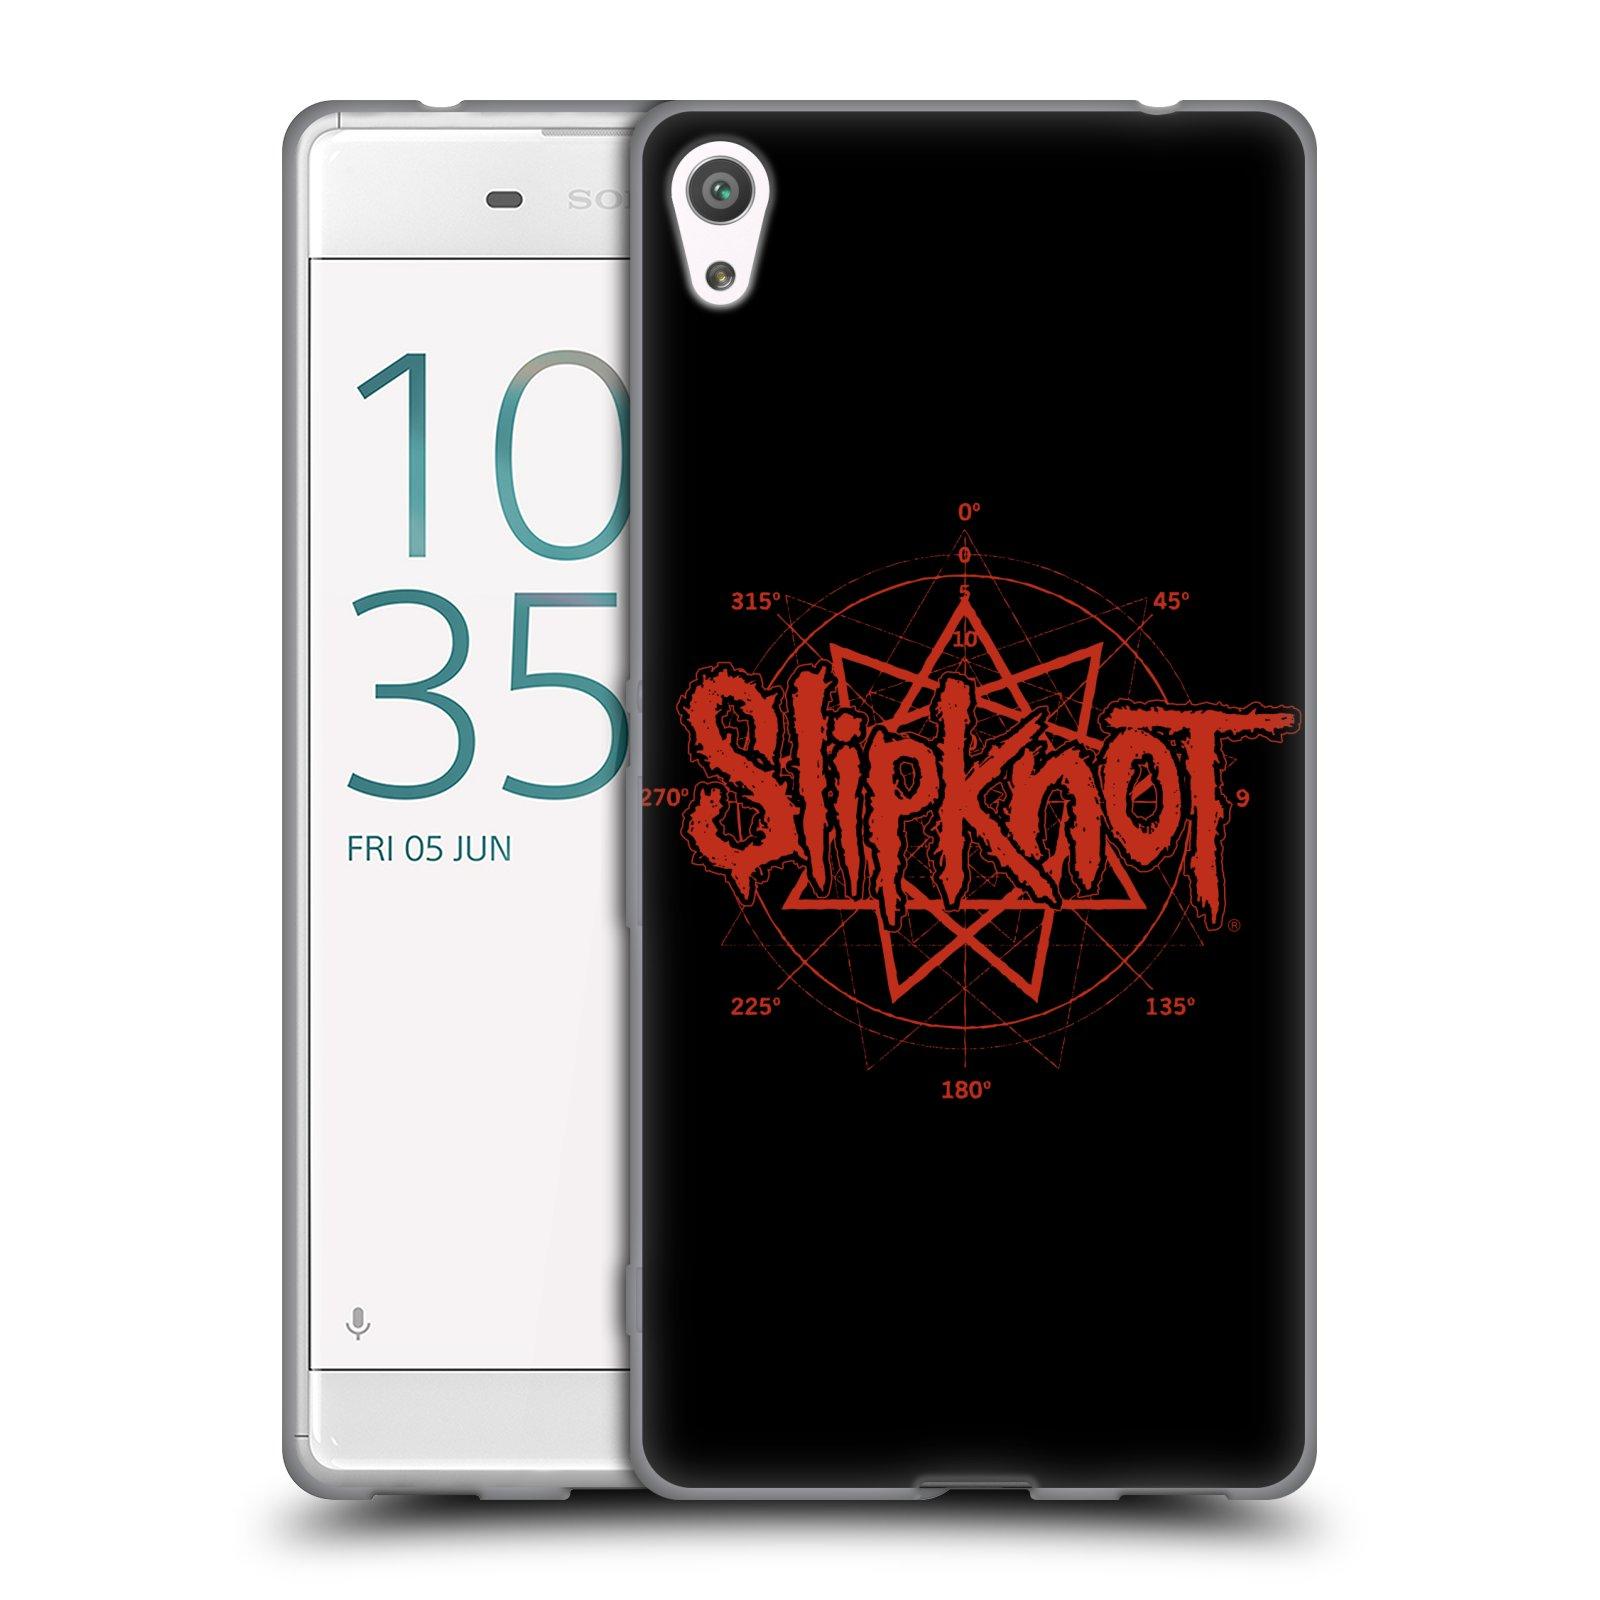 HEAD CASE silikonový obal na mobil Sony Xperia XA ULTRA hudební skupina Slipknot logo